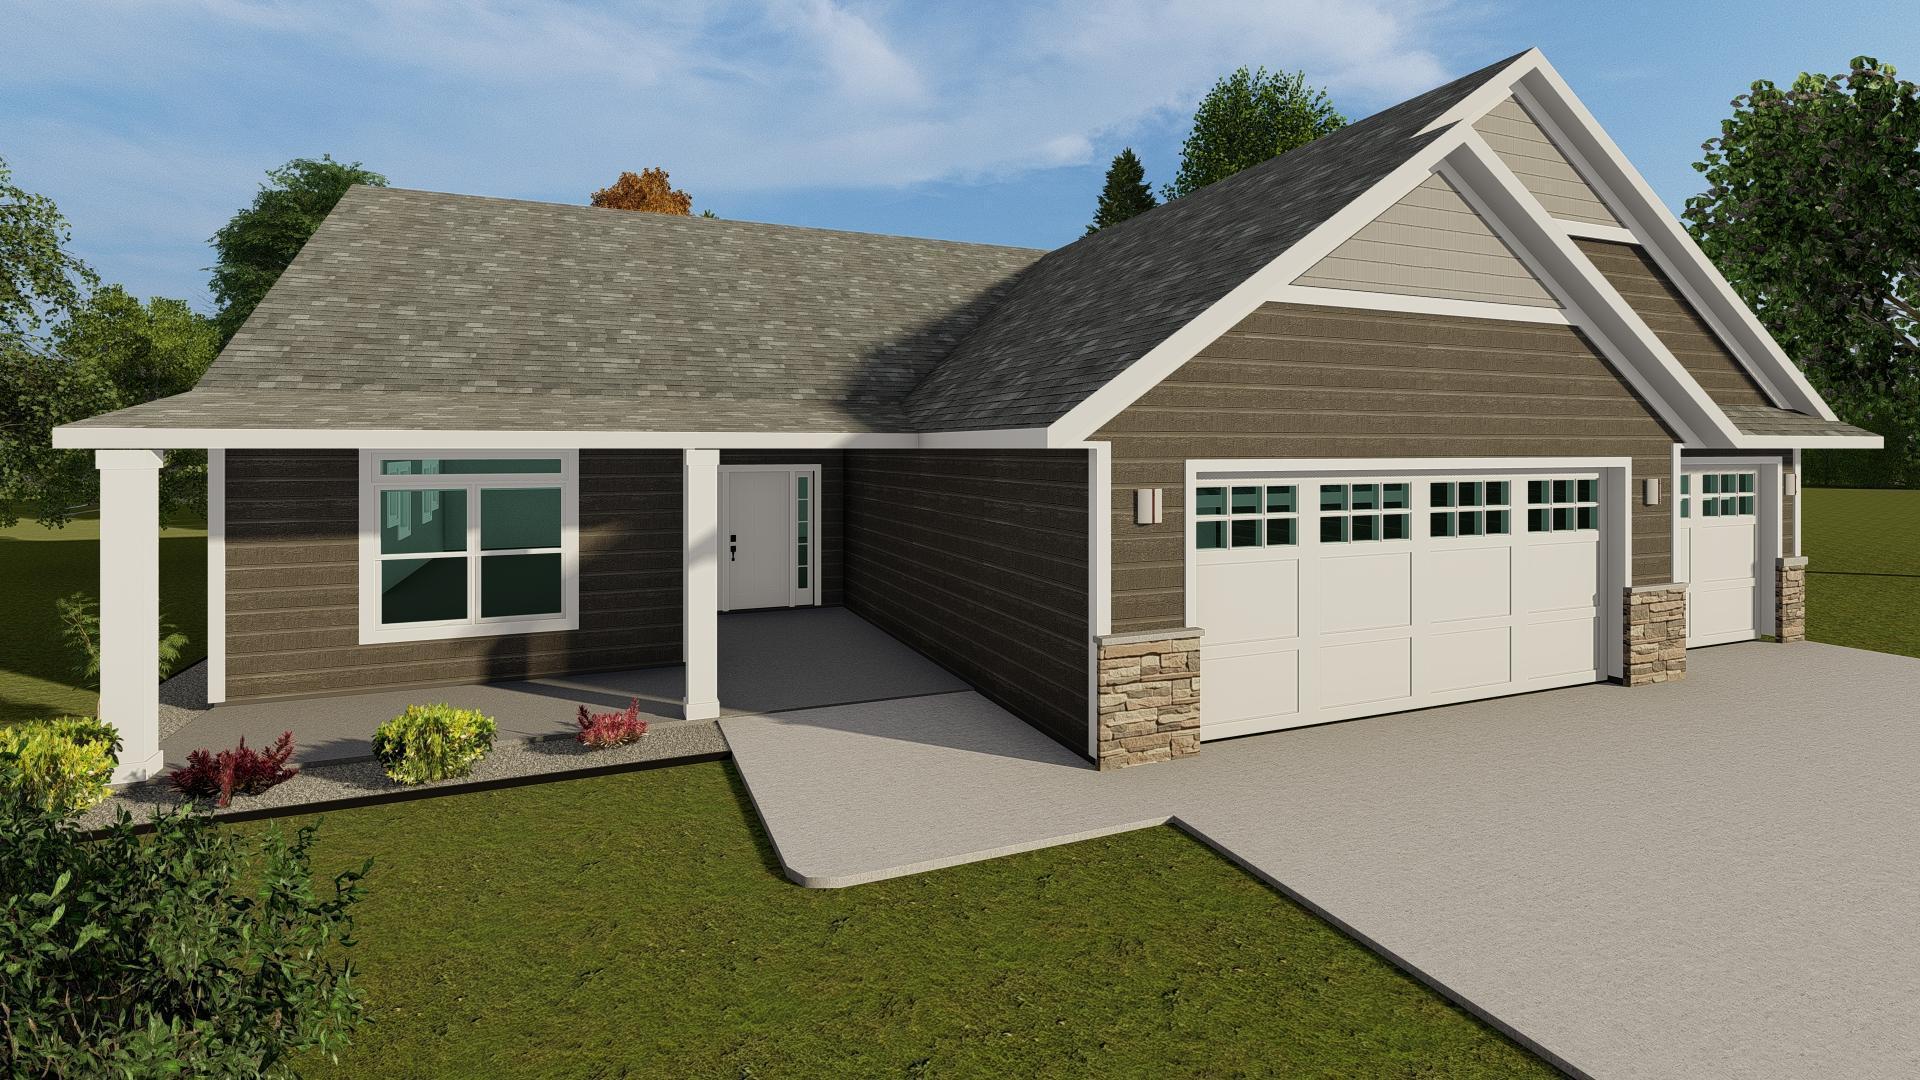 Lot46 Blk1 Jessie View Drive Se Property Photo